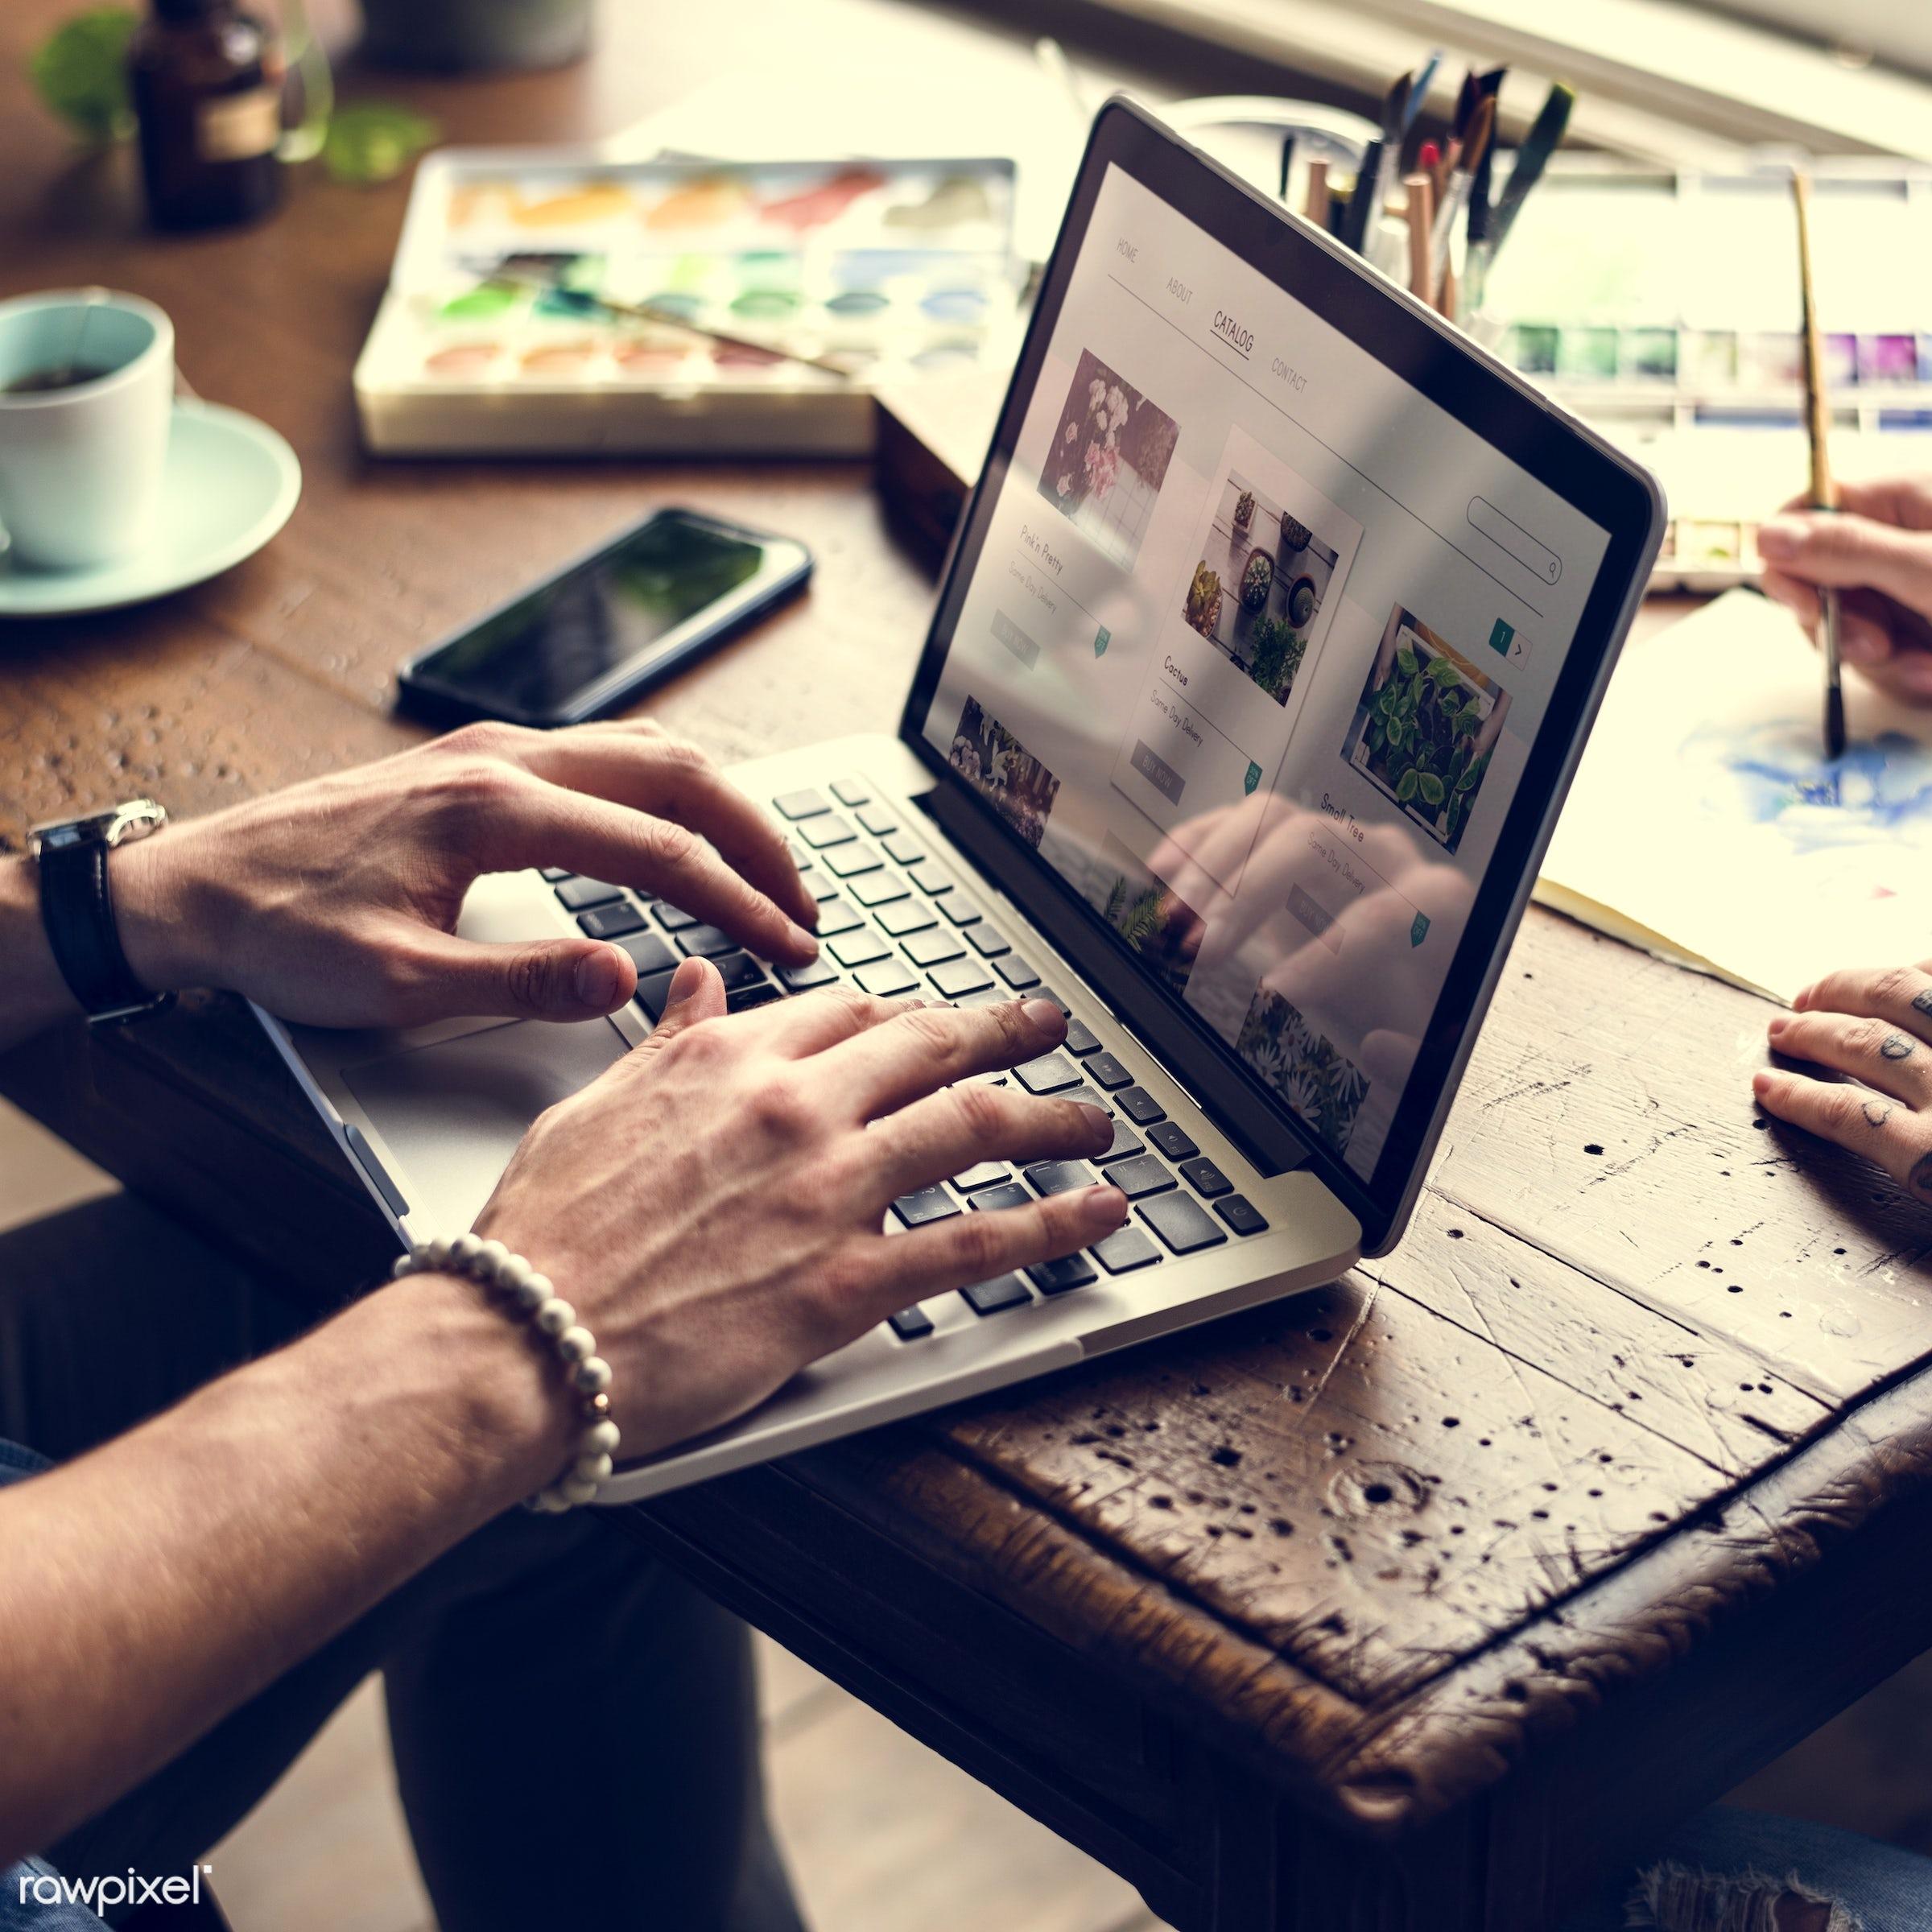 shop, detail, using, merchandise, buy, customer, consumer, friends, search, social, laptop, working, surf, choose, flower,...